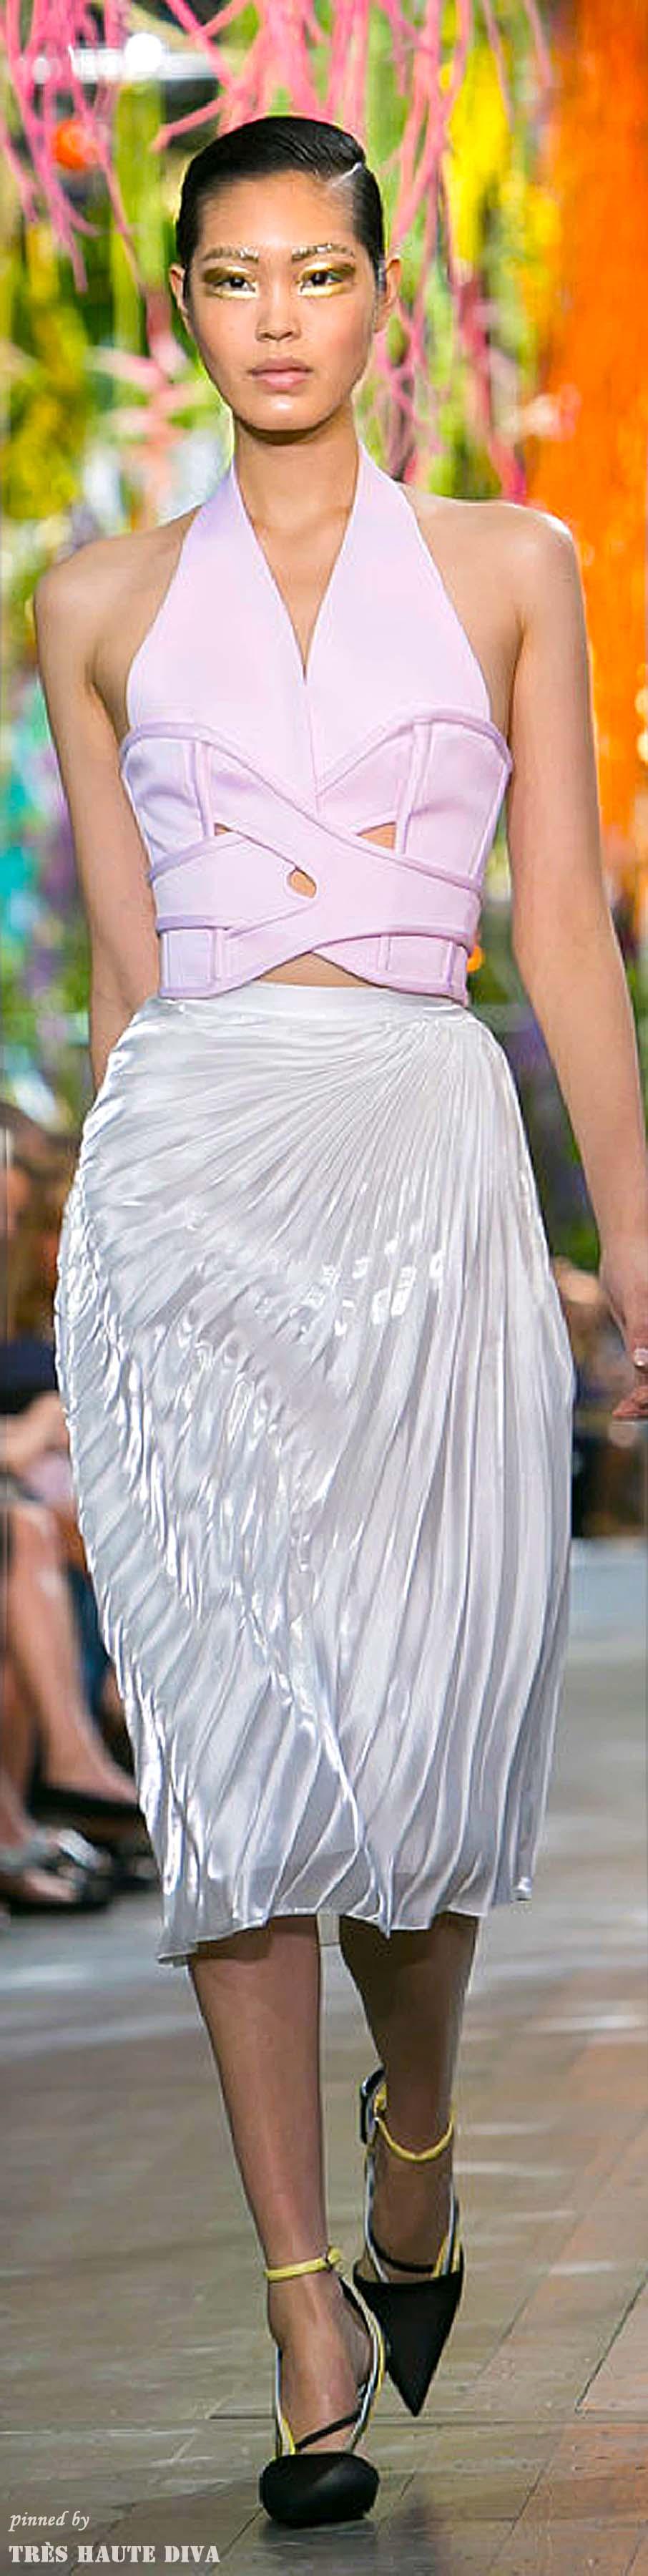 #Paris FW Christian Dior Spring / Summer 2014